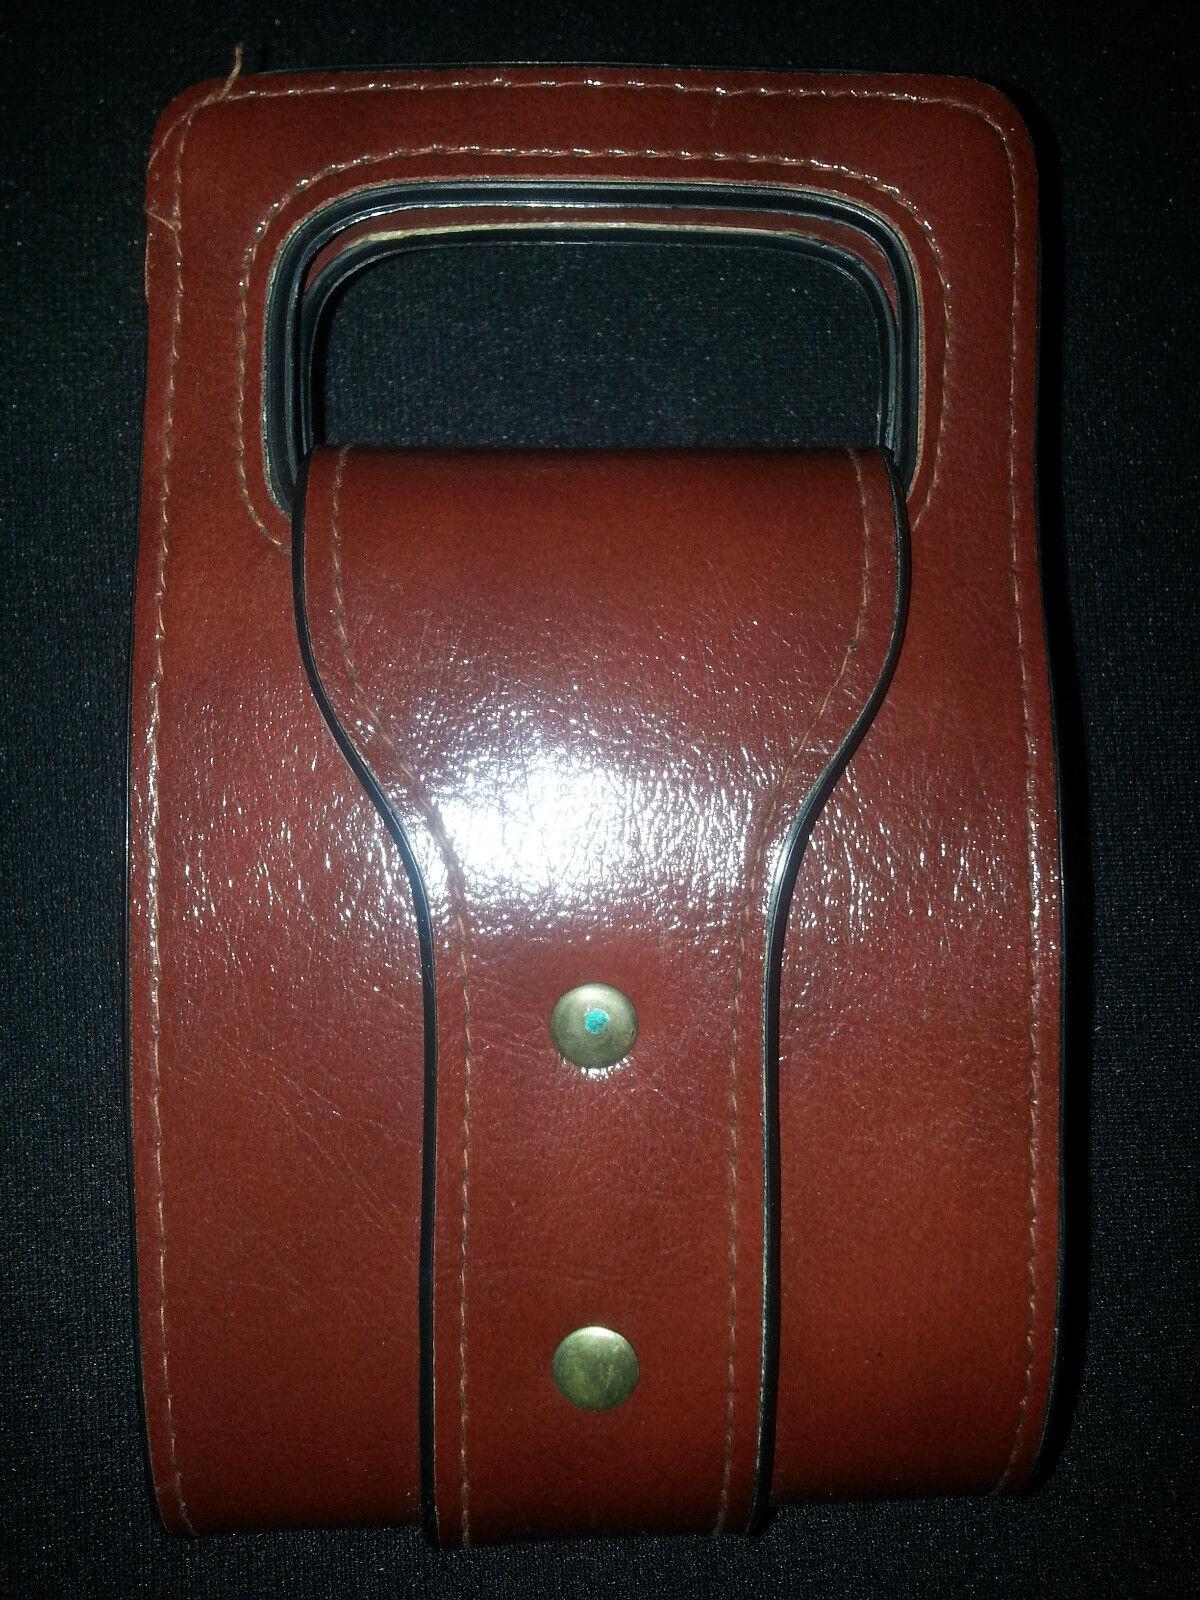 NWOT Vintage 1972-72 Brown Bifold Clutch Wallet Purse Handbag Size 7X4 Pictures